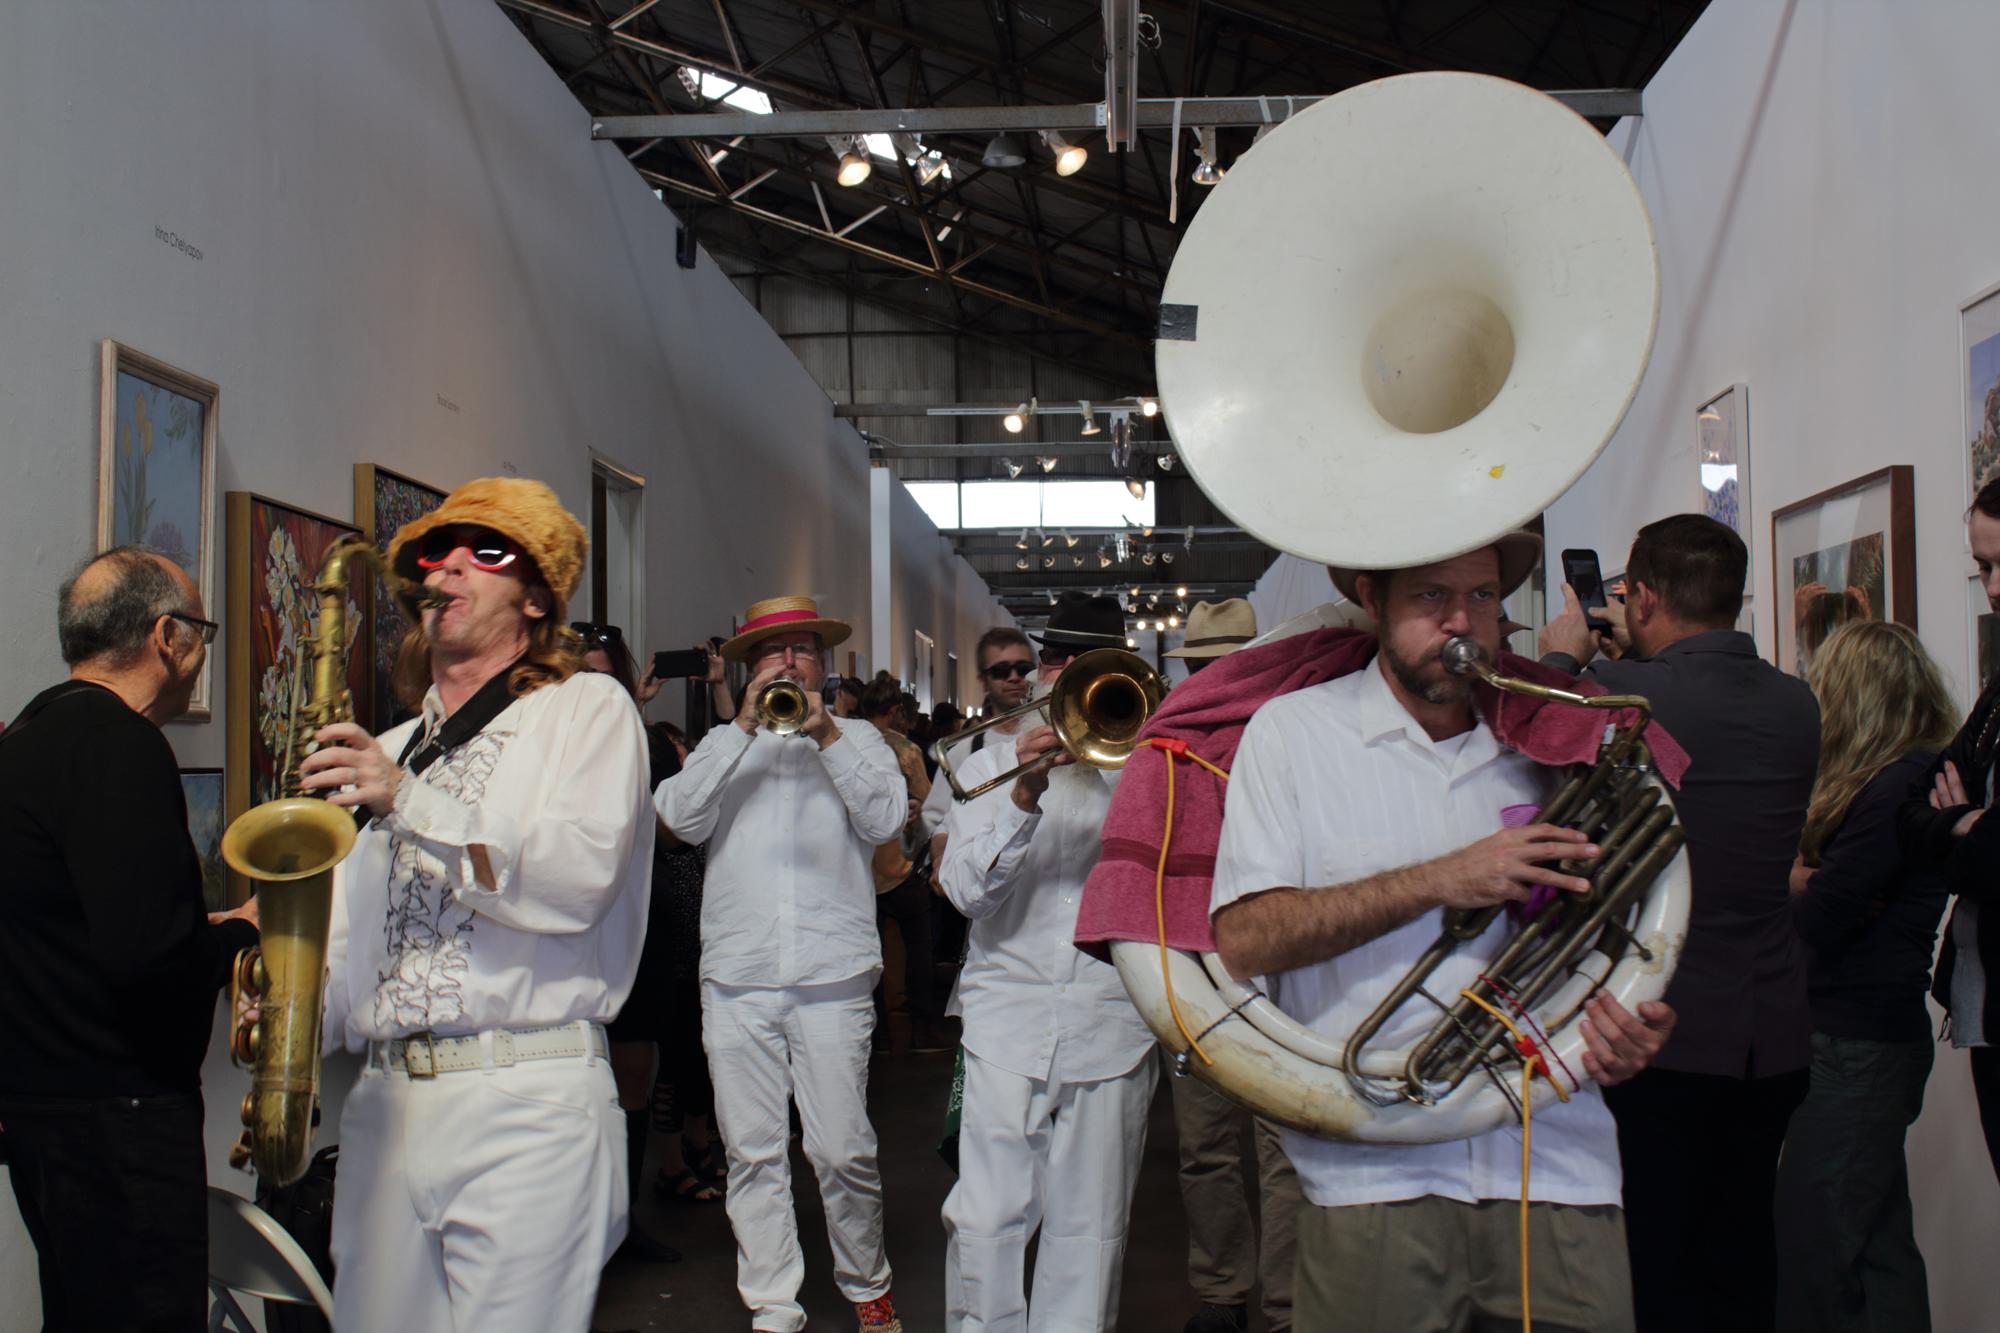 Carmen Peréz Memorial Marching Band playing down the hall of the Santa Monica Art Studios while spectators watch at the 12 Annual Santa Monica ArtWalk on March 24th, 2018 in Santa Monica, California. (Heather Creamer/ Corsair Photo).